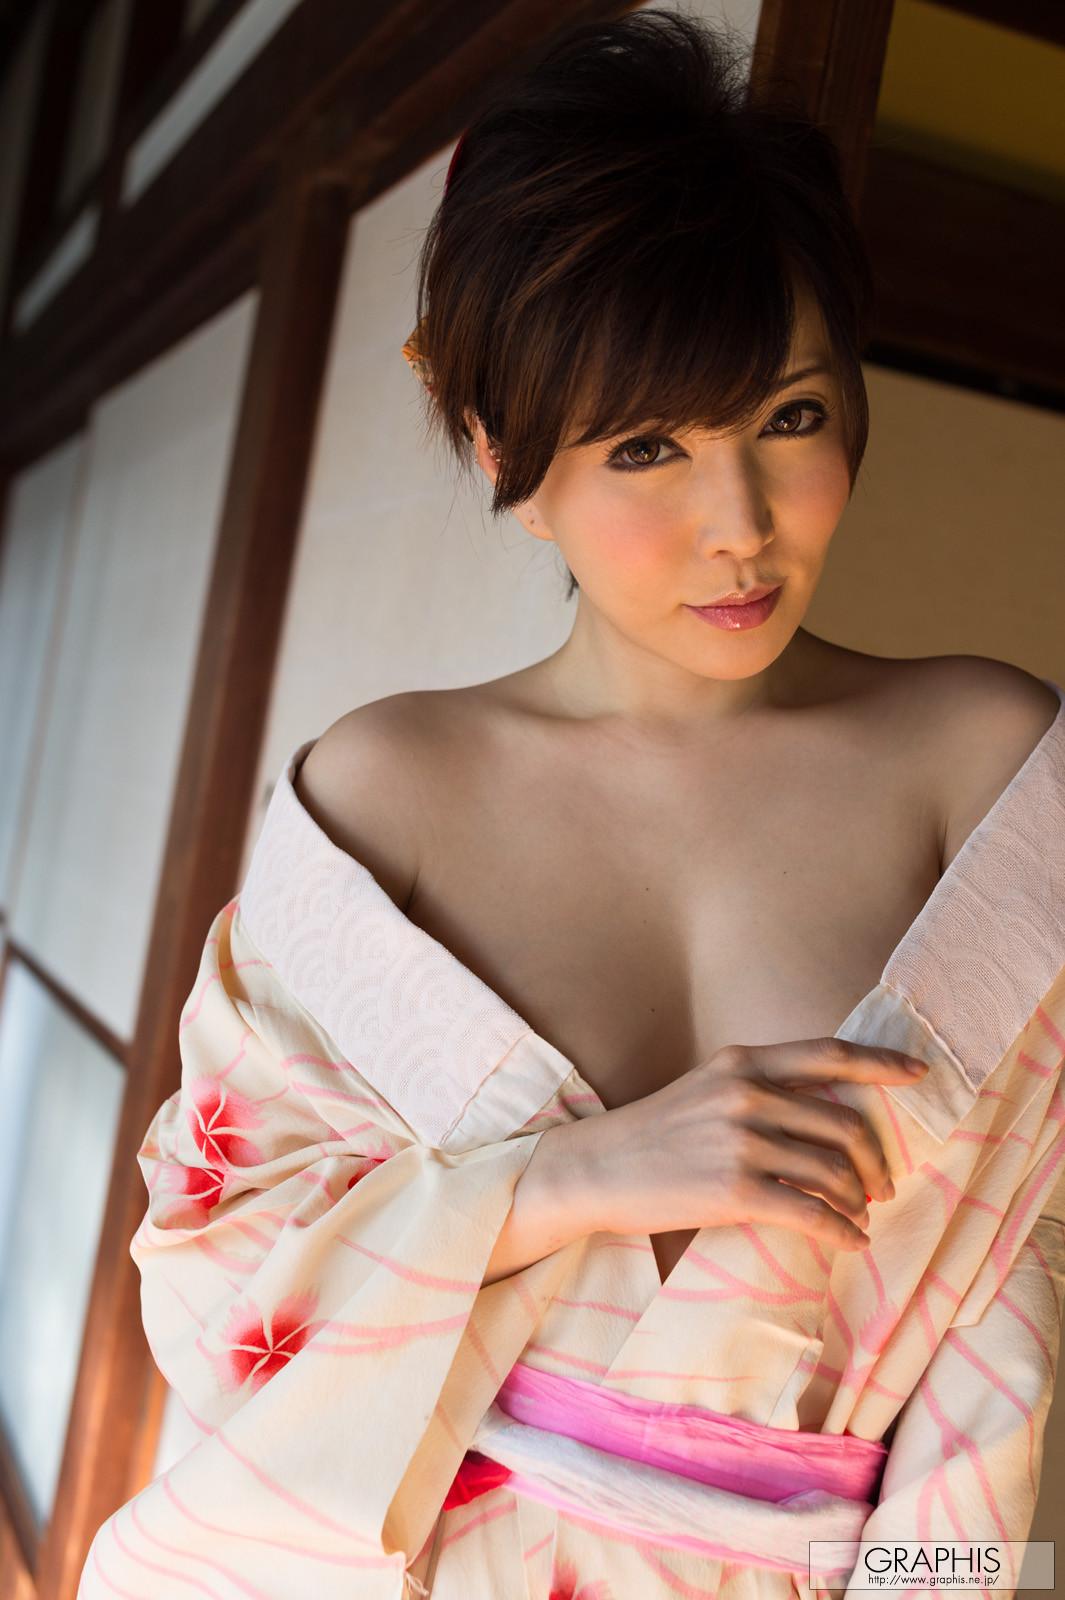 satomi-yuria-064